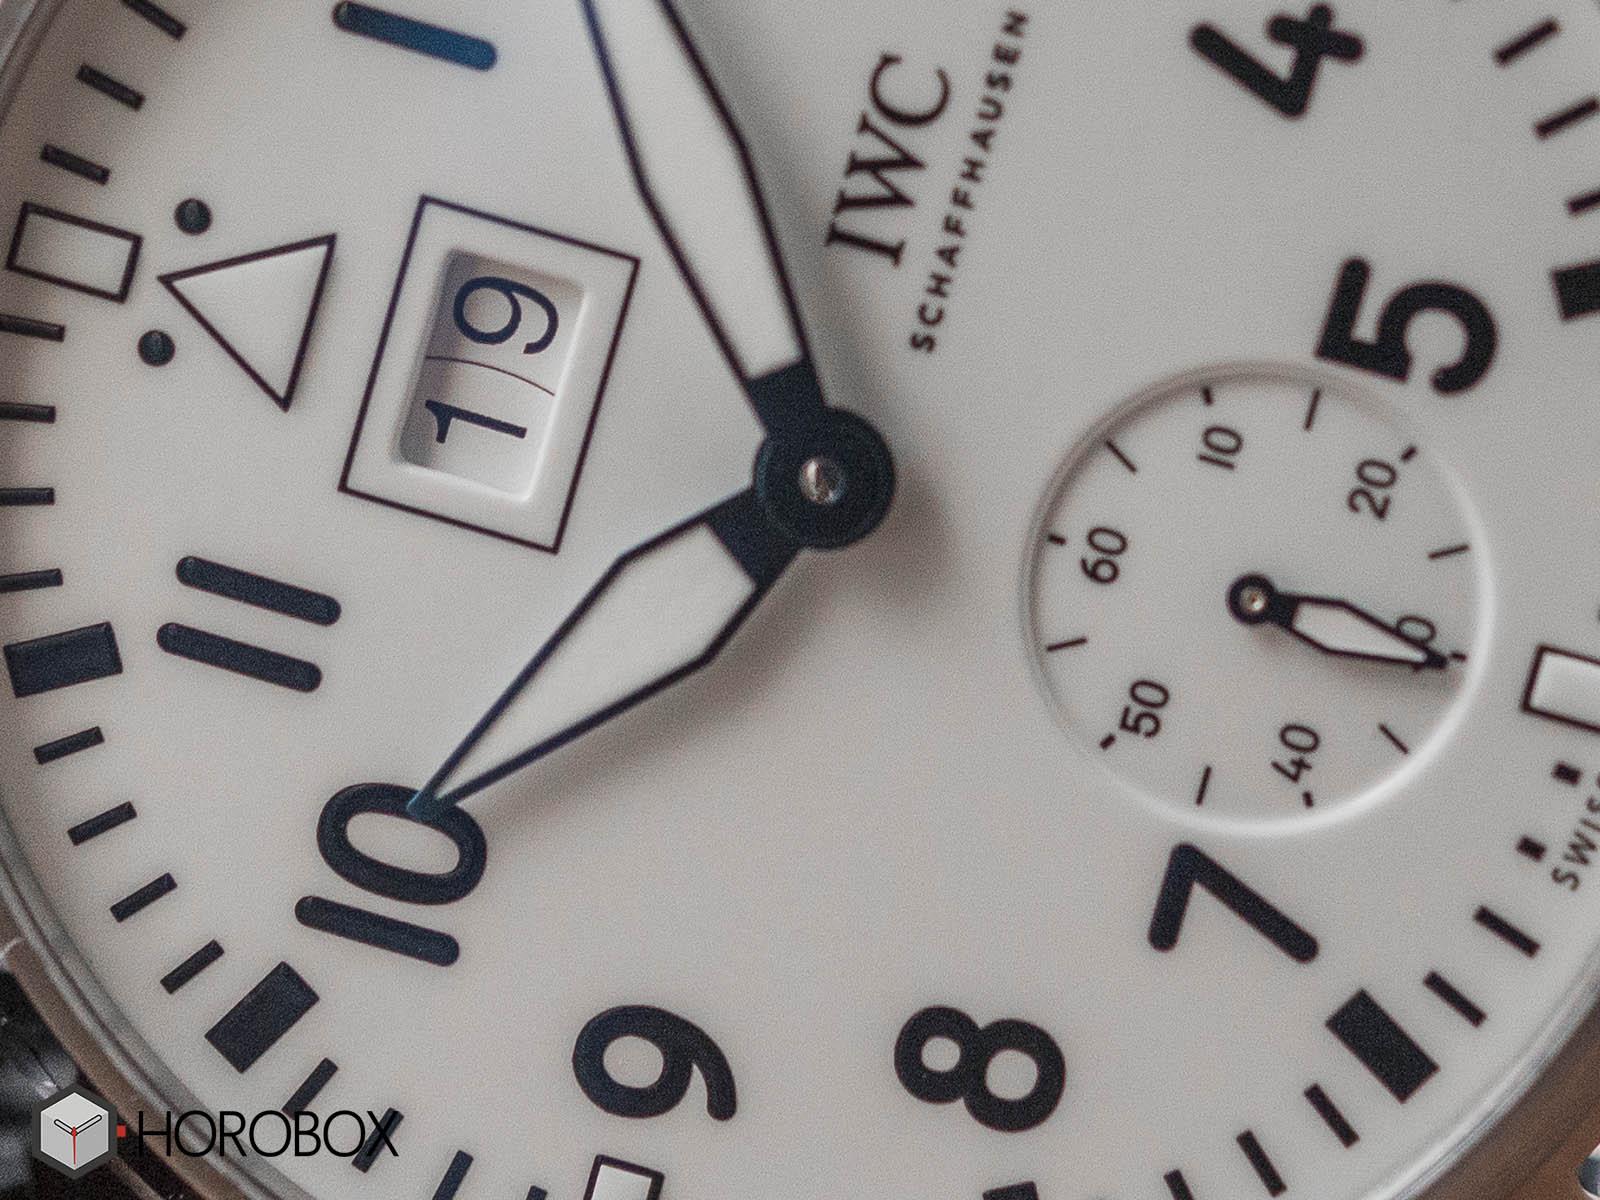 iw510504-iwc-Big-Pilot-s-Watch-Big-Date-Edition-150-Years-Sihh2018-4.jpg